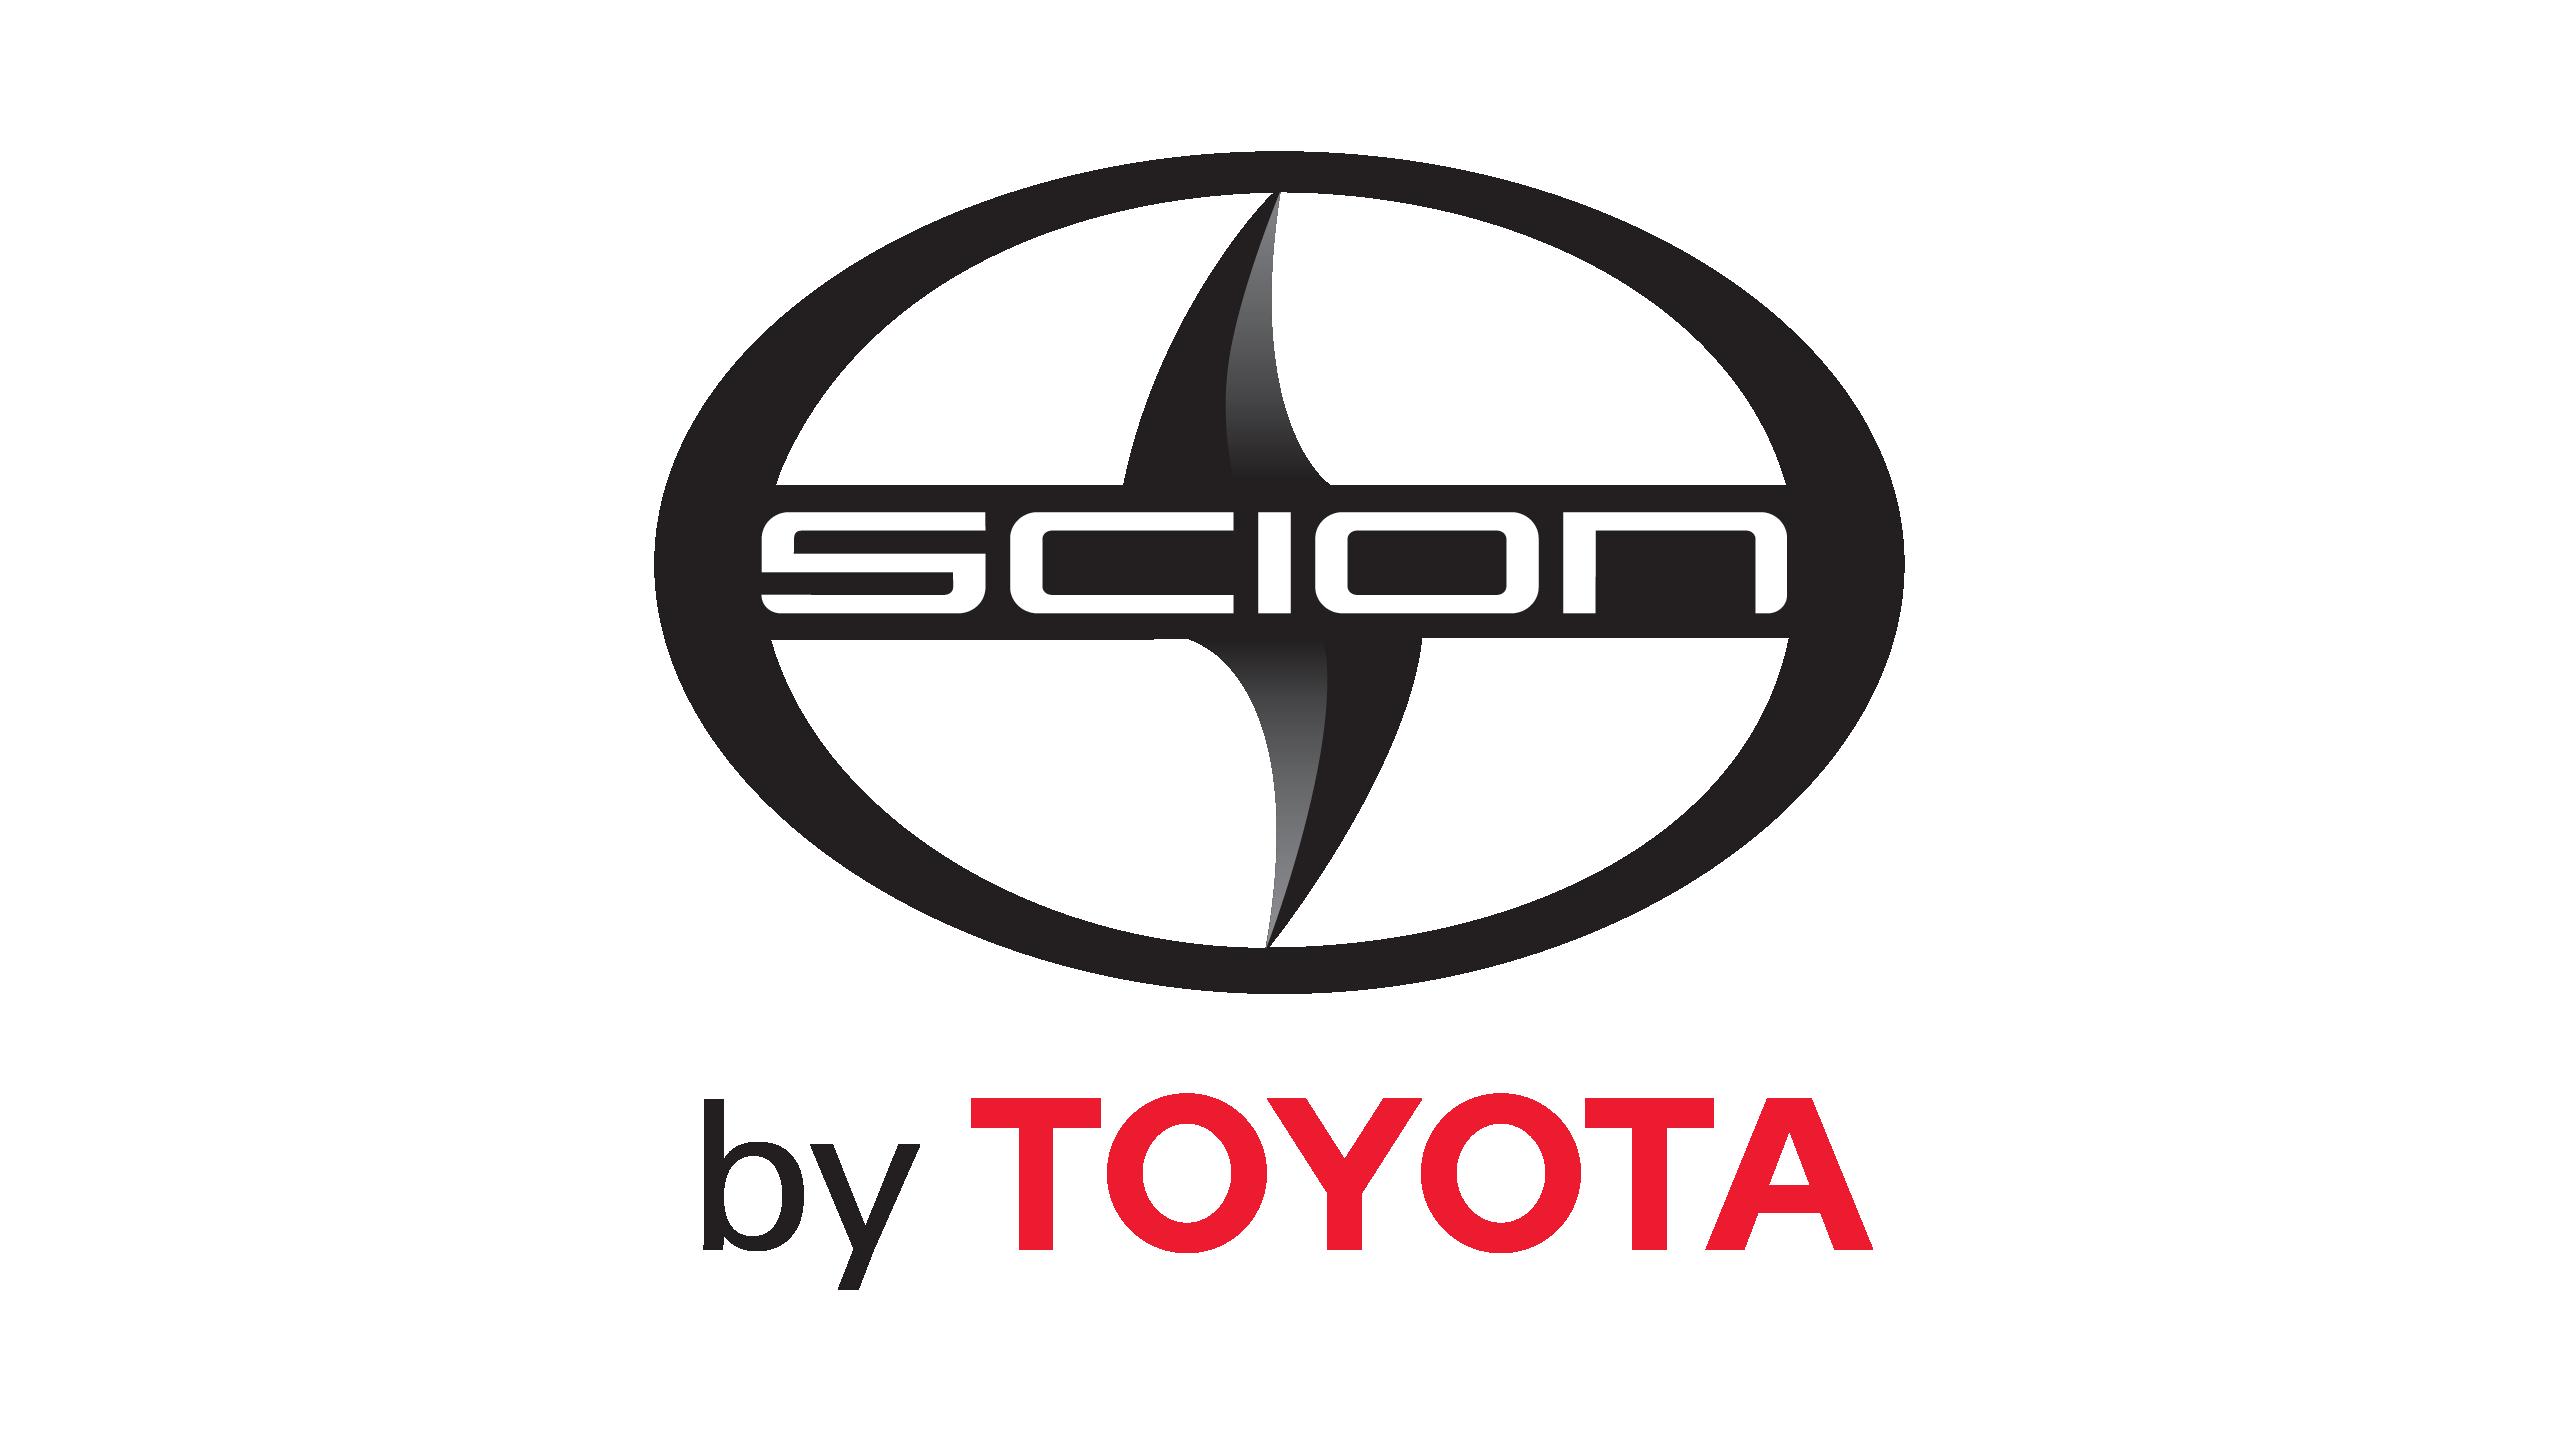 scion logo hd png meaning information carlogosorg